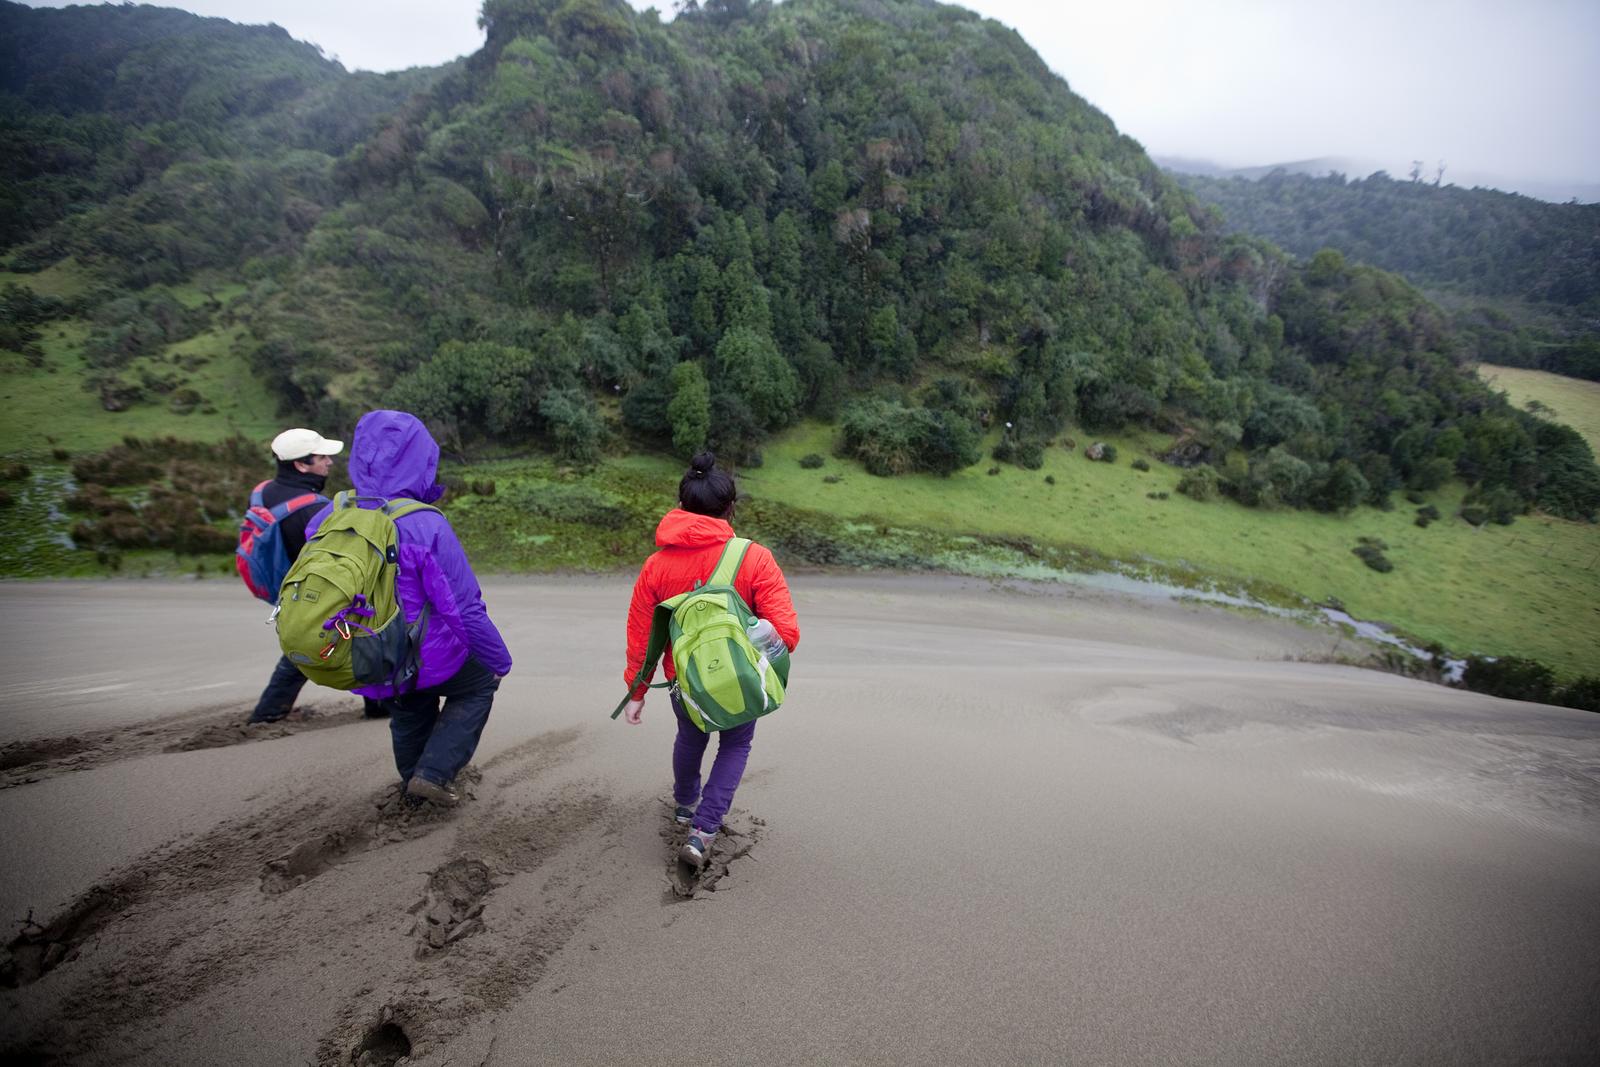 Valdivia Coastal Reserve, Chile: Sand dunes are slowly overtaking the temperate rainforest. Photo © Ian Shive